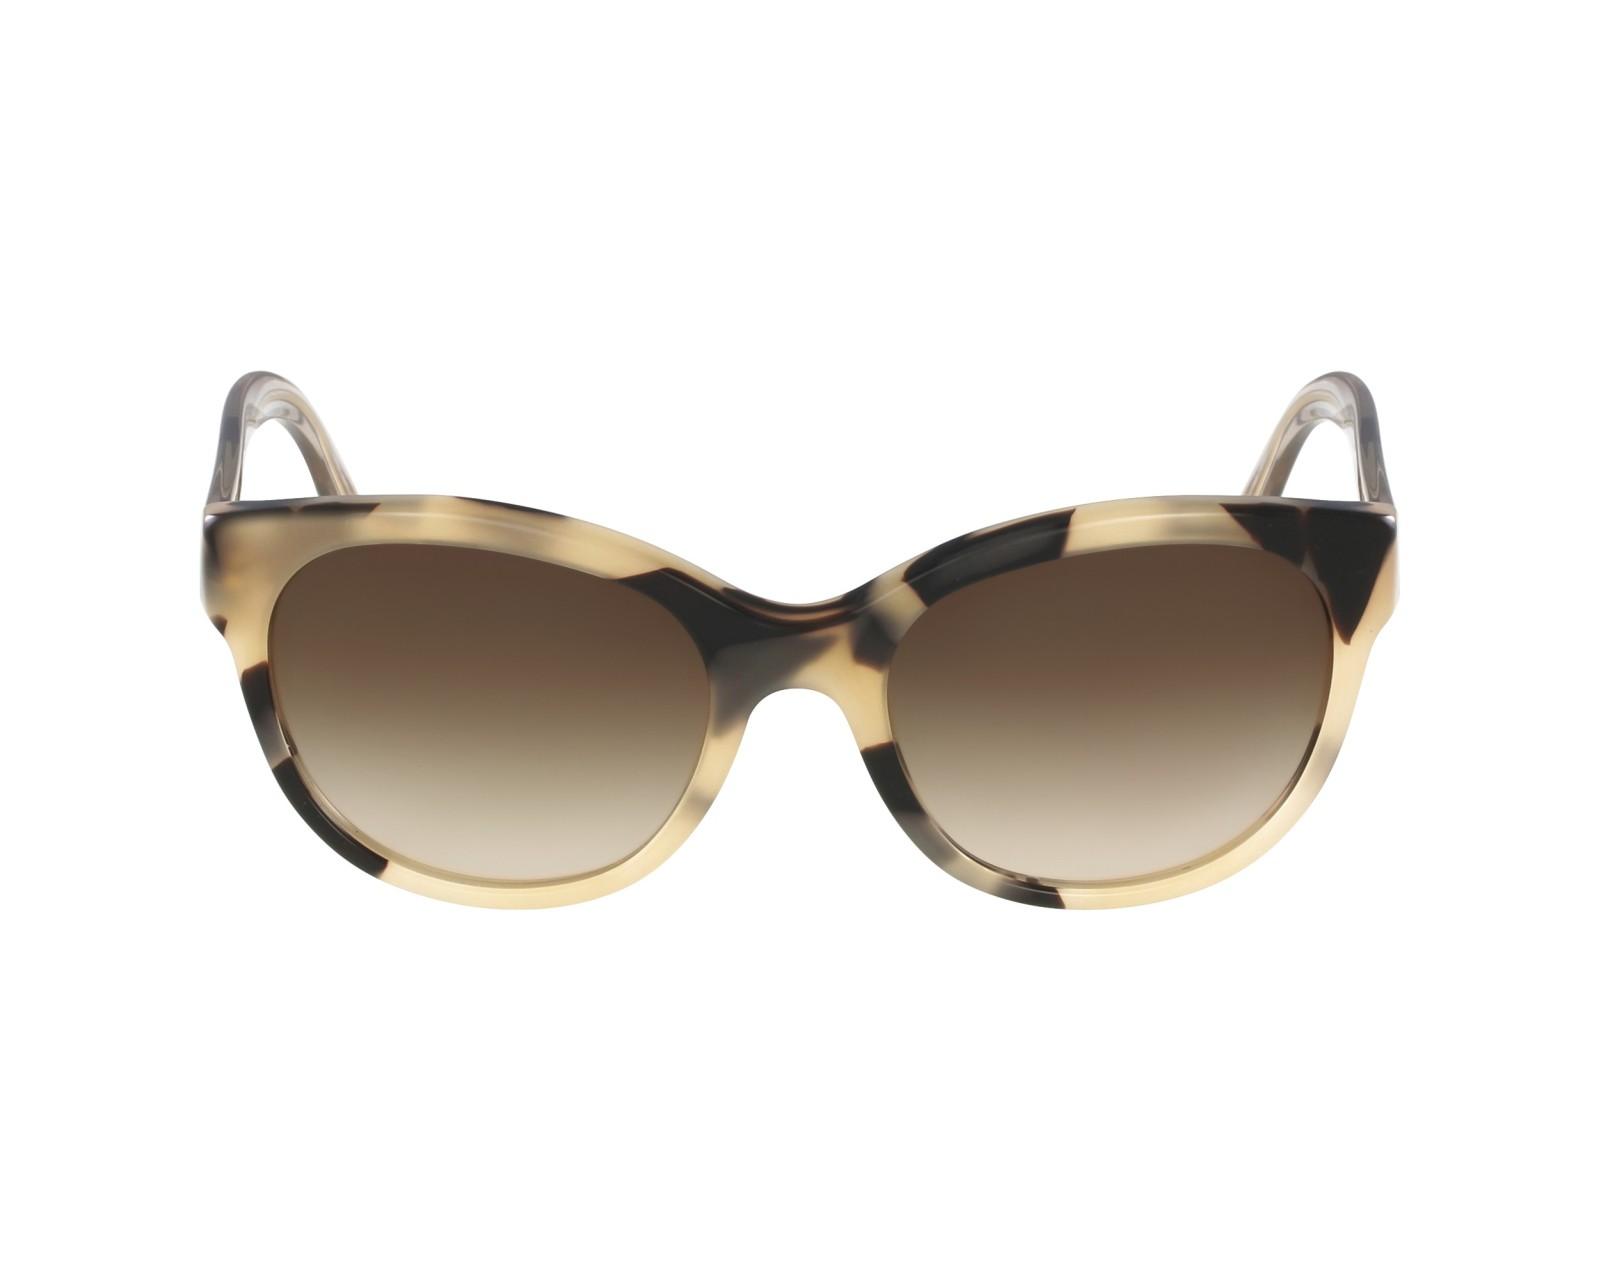 f9a65d7c66 Sunglasses Burberry BE-4187 3502 13 - Beige Gold profile view